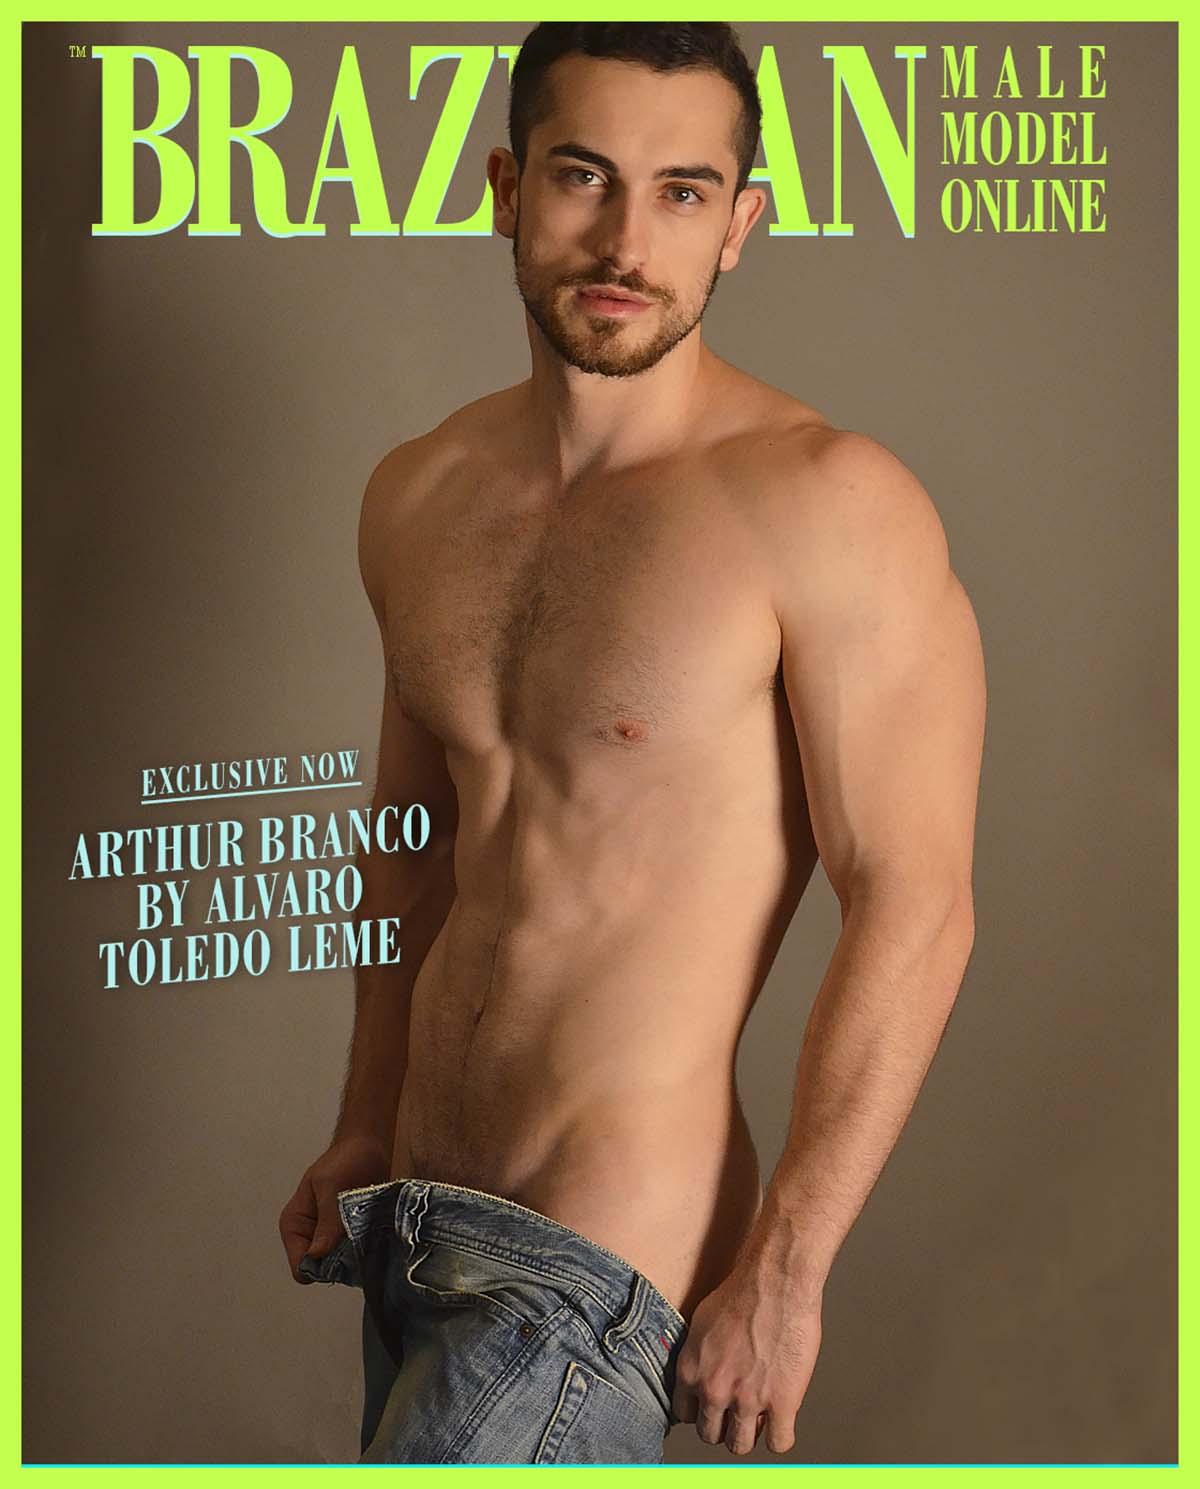 Arthur Branco X Alvaro Toledo Leme X Brazilian Male Model X YUP MAGAZINE